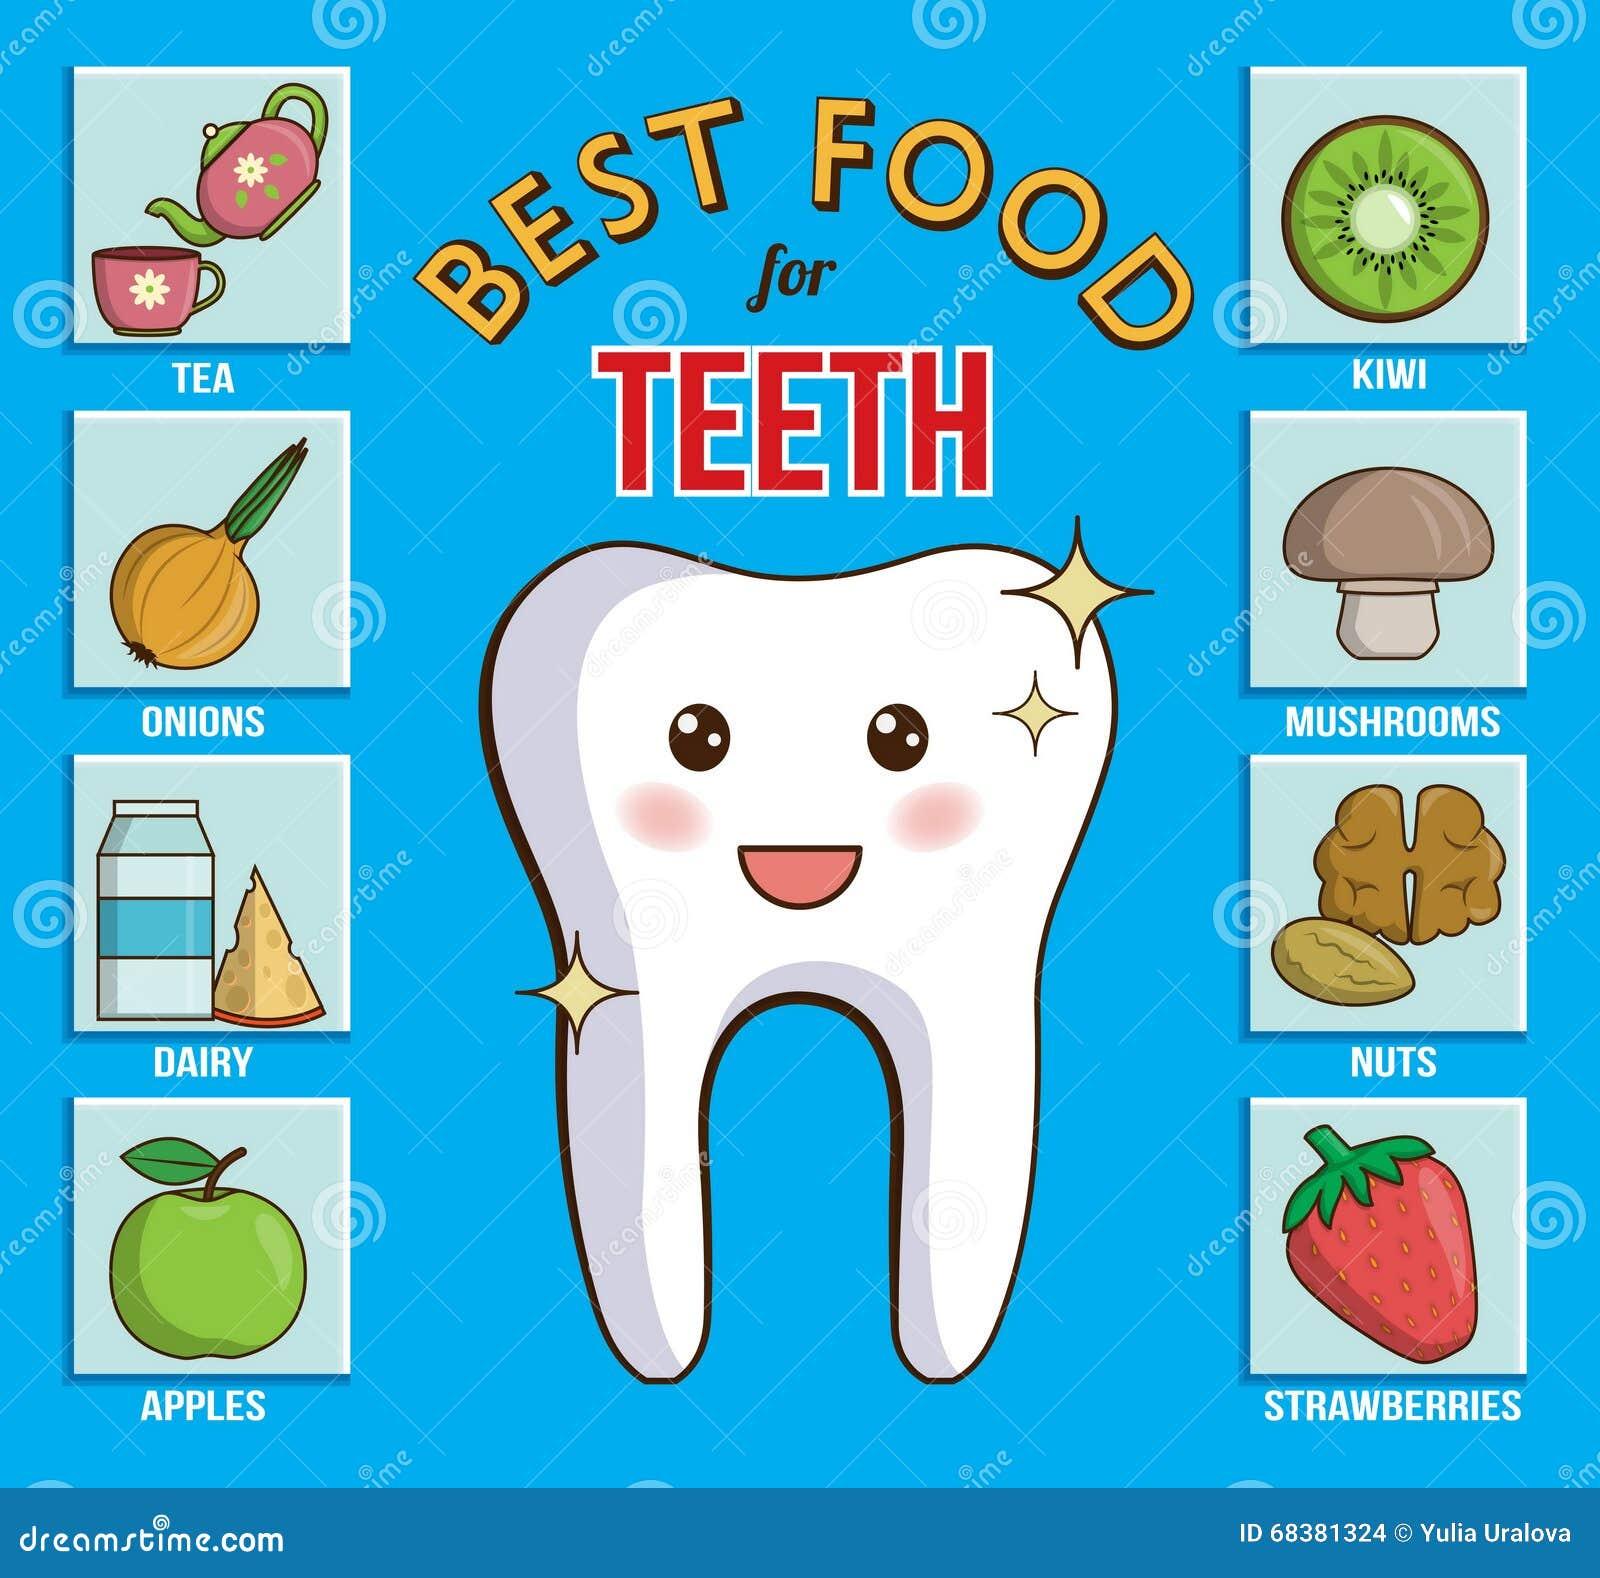 Good Food And Bad Food For Teeth Poster